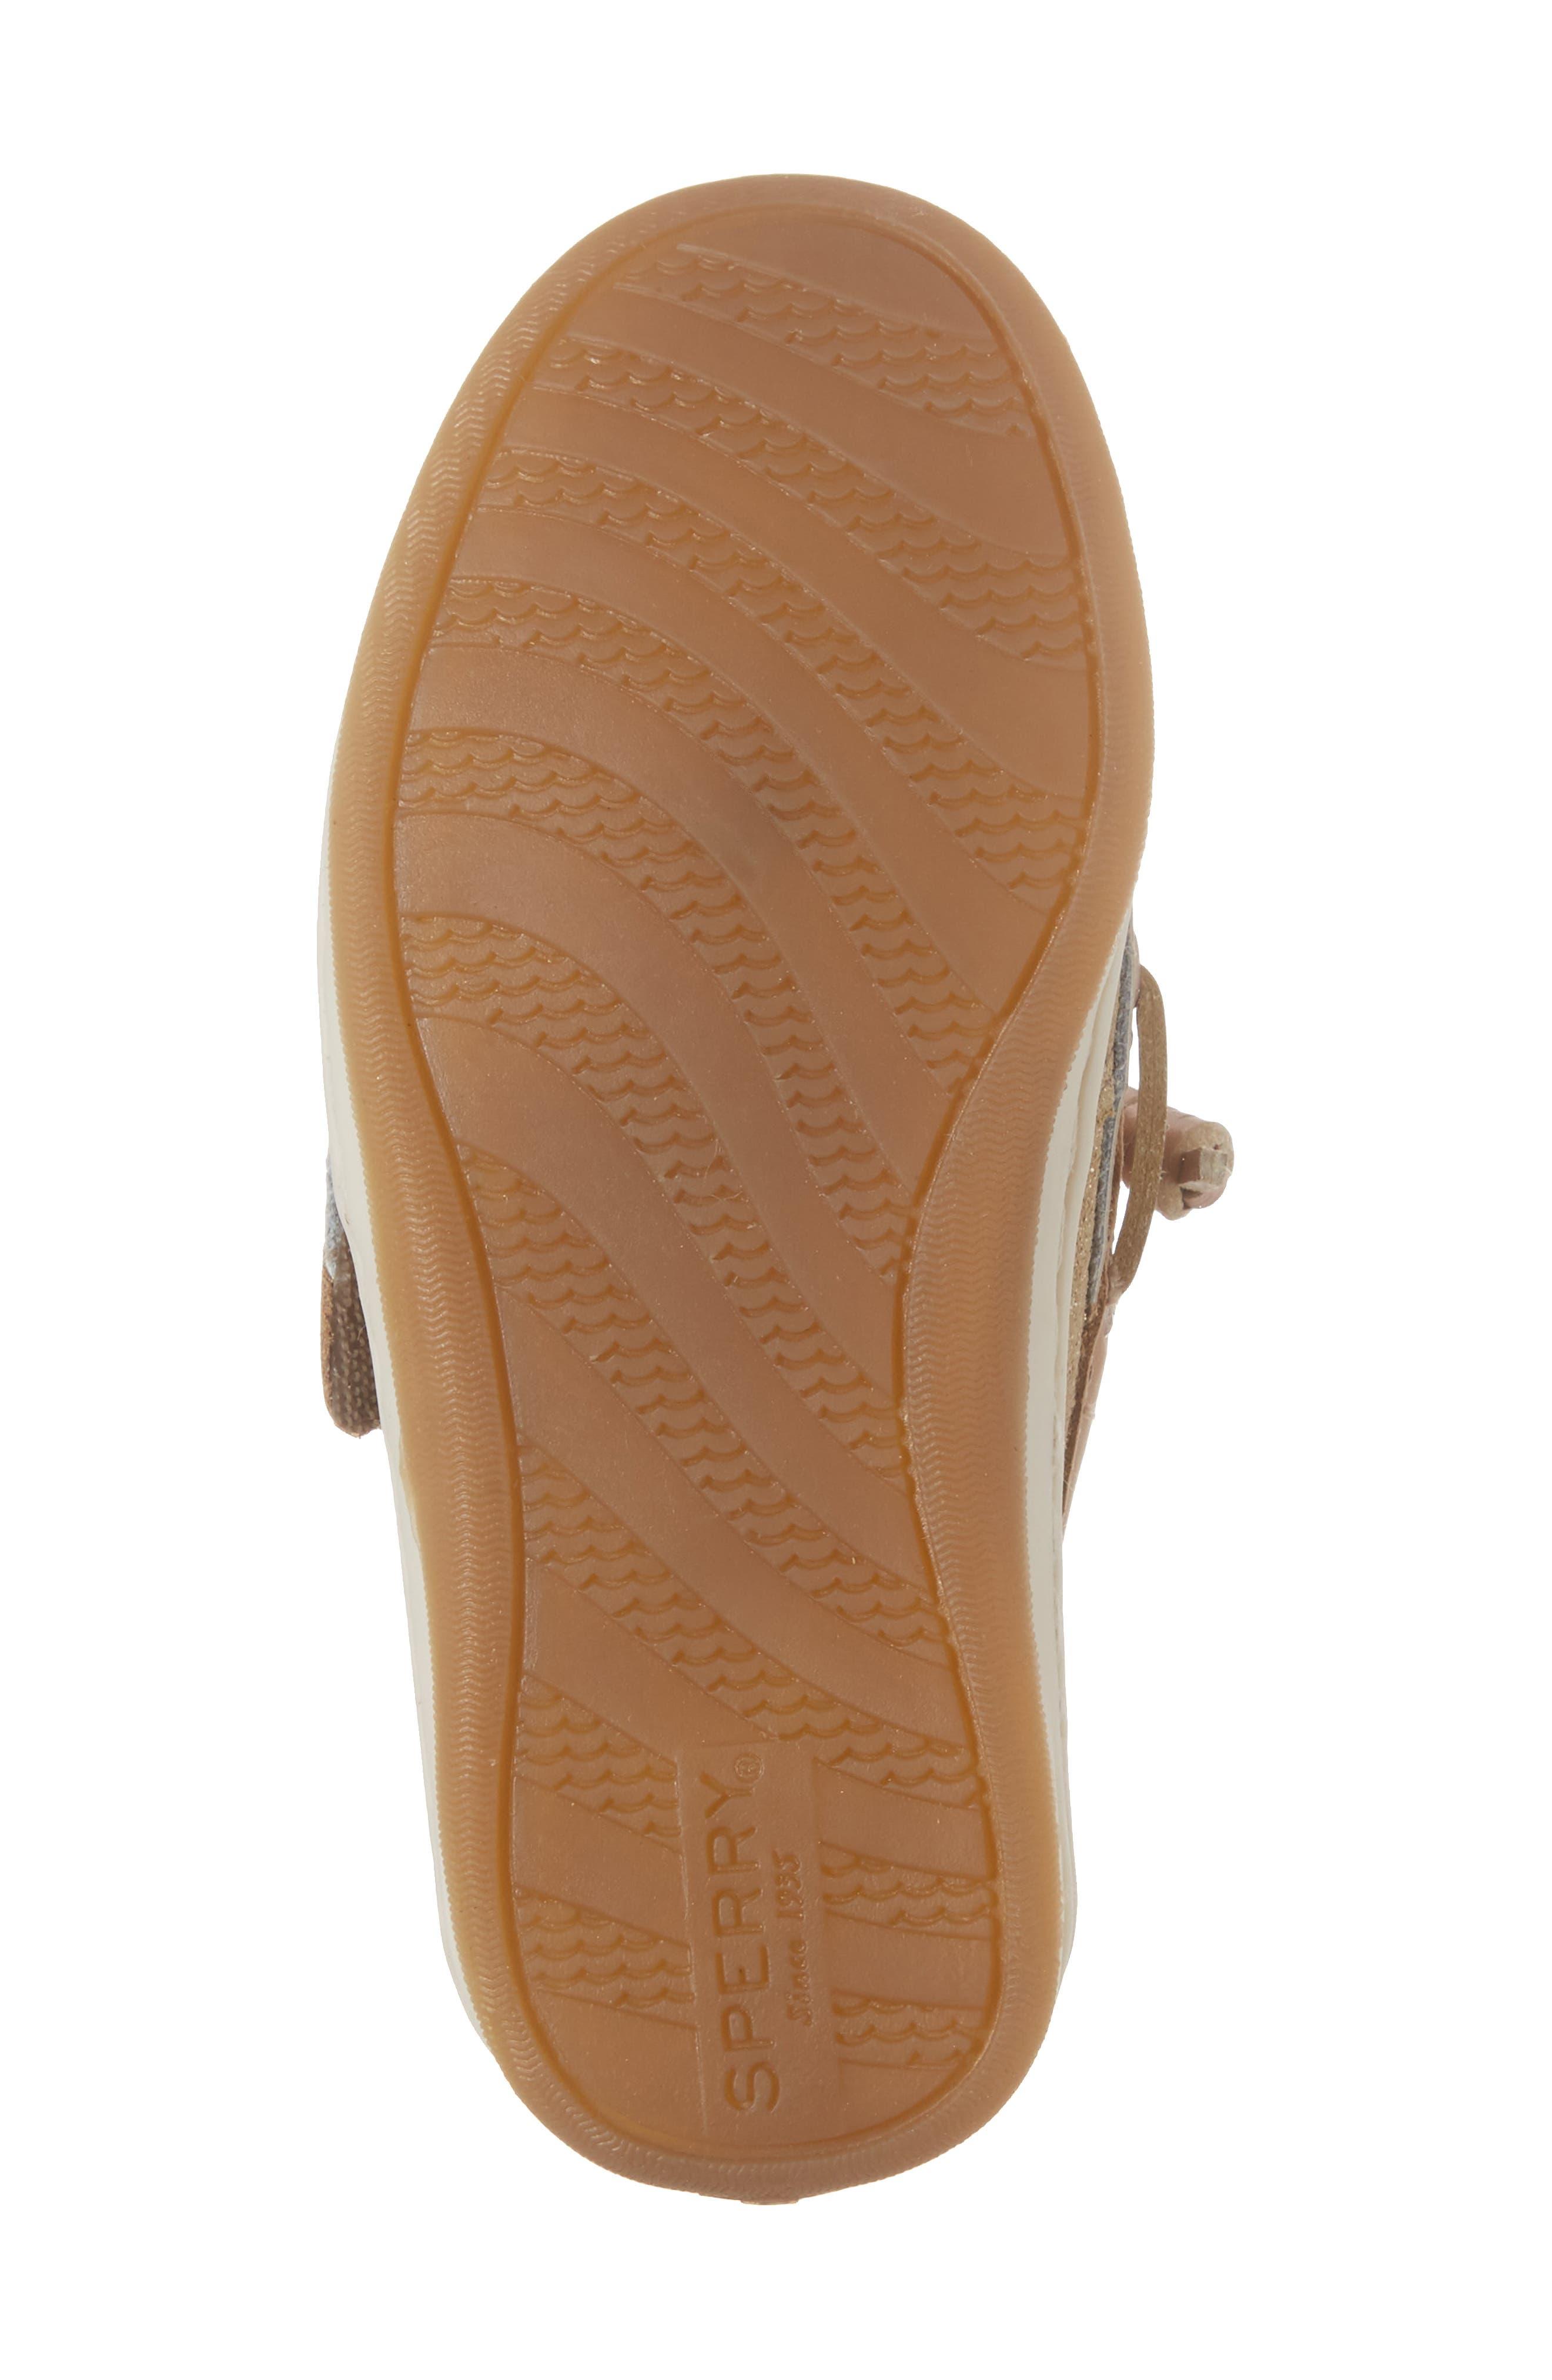 'Songfish Jr' Boat Shoe,                             Alternate thumbnail 6, color,                             Linen/ Gold